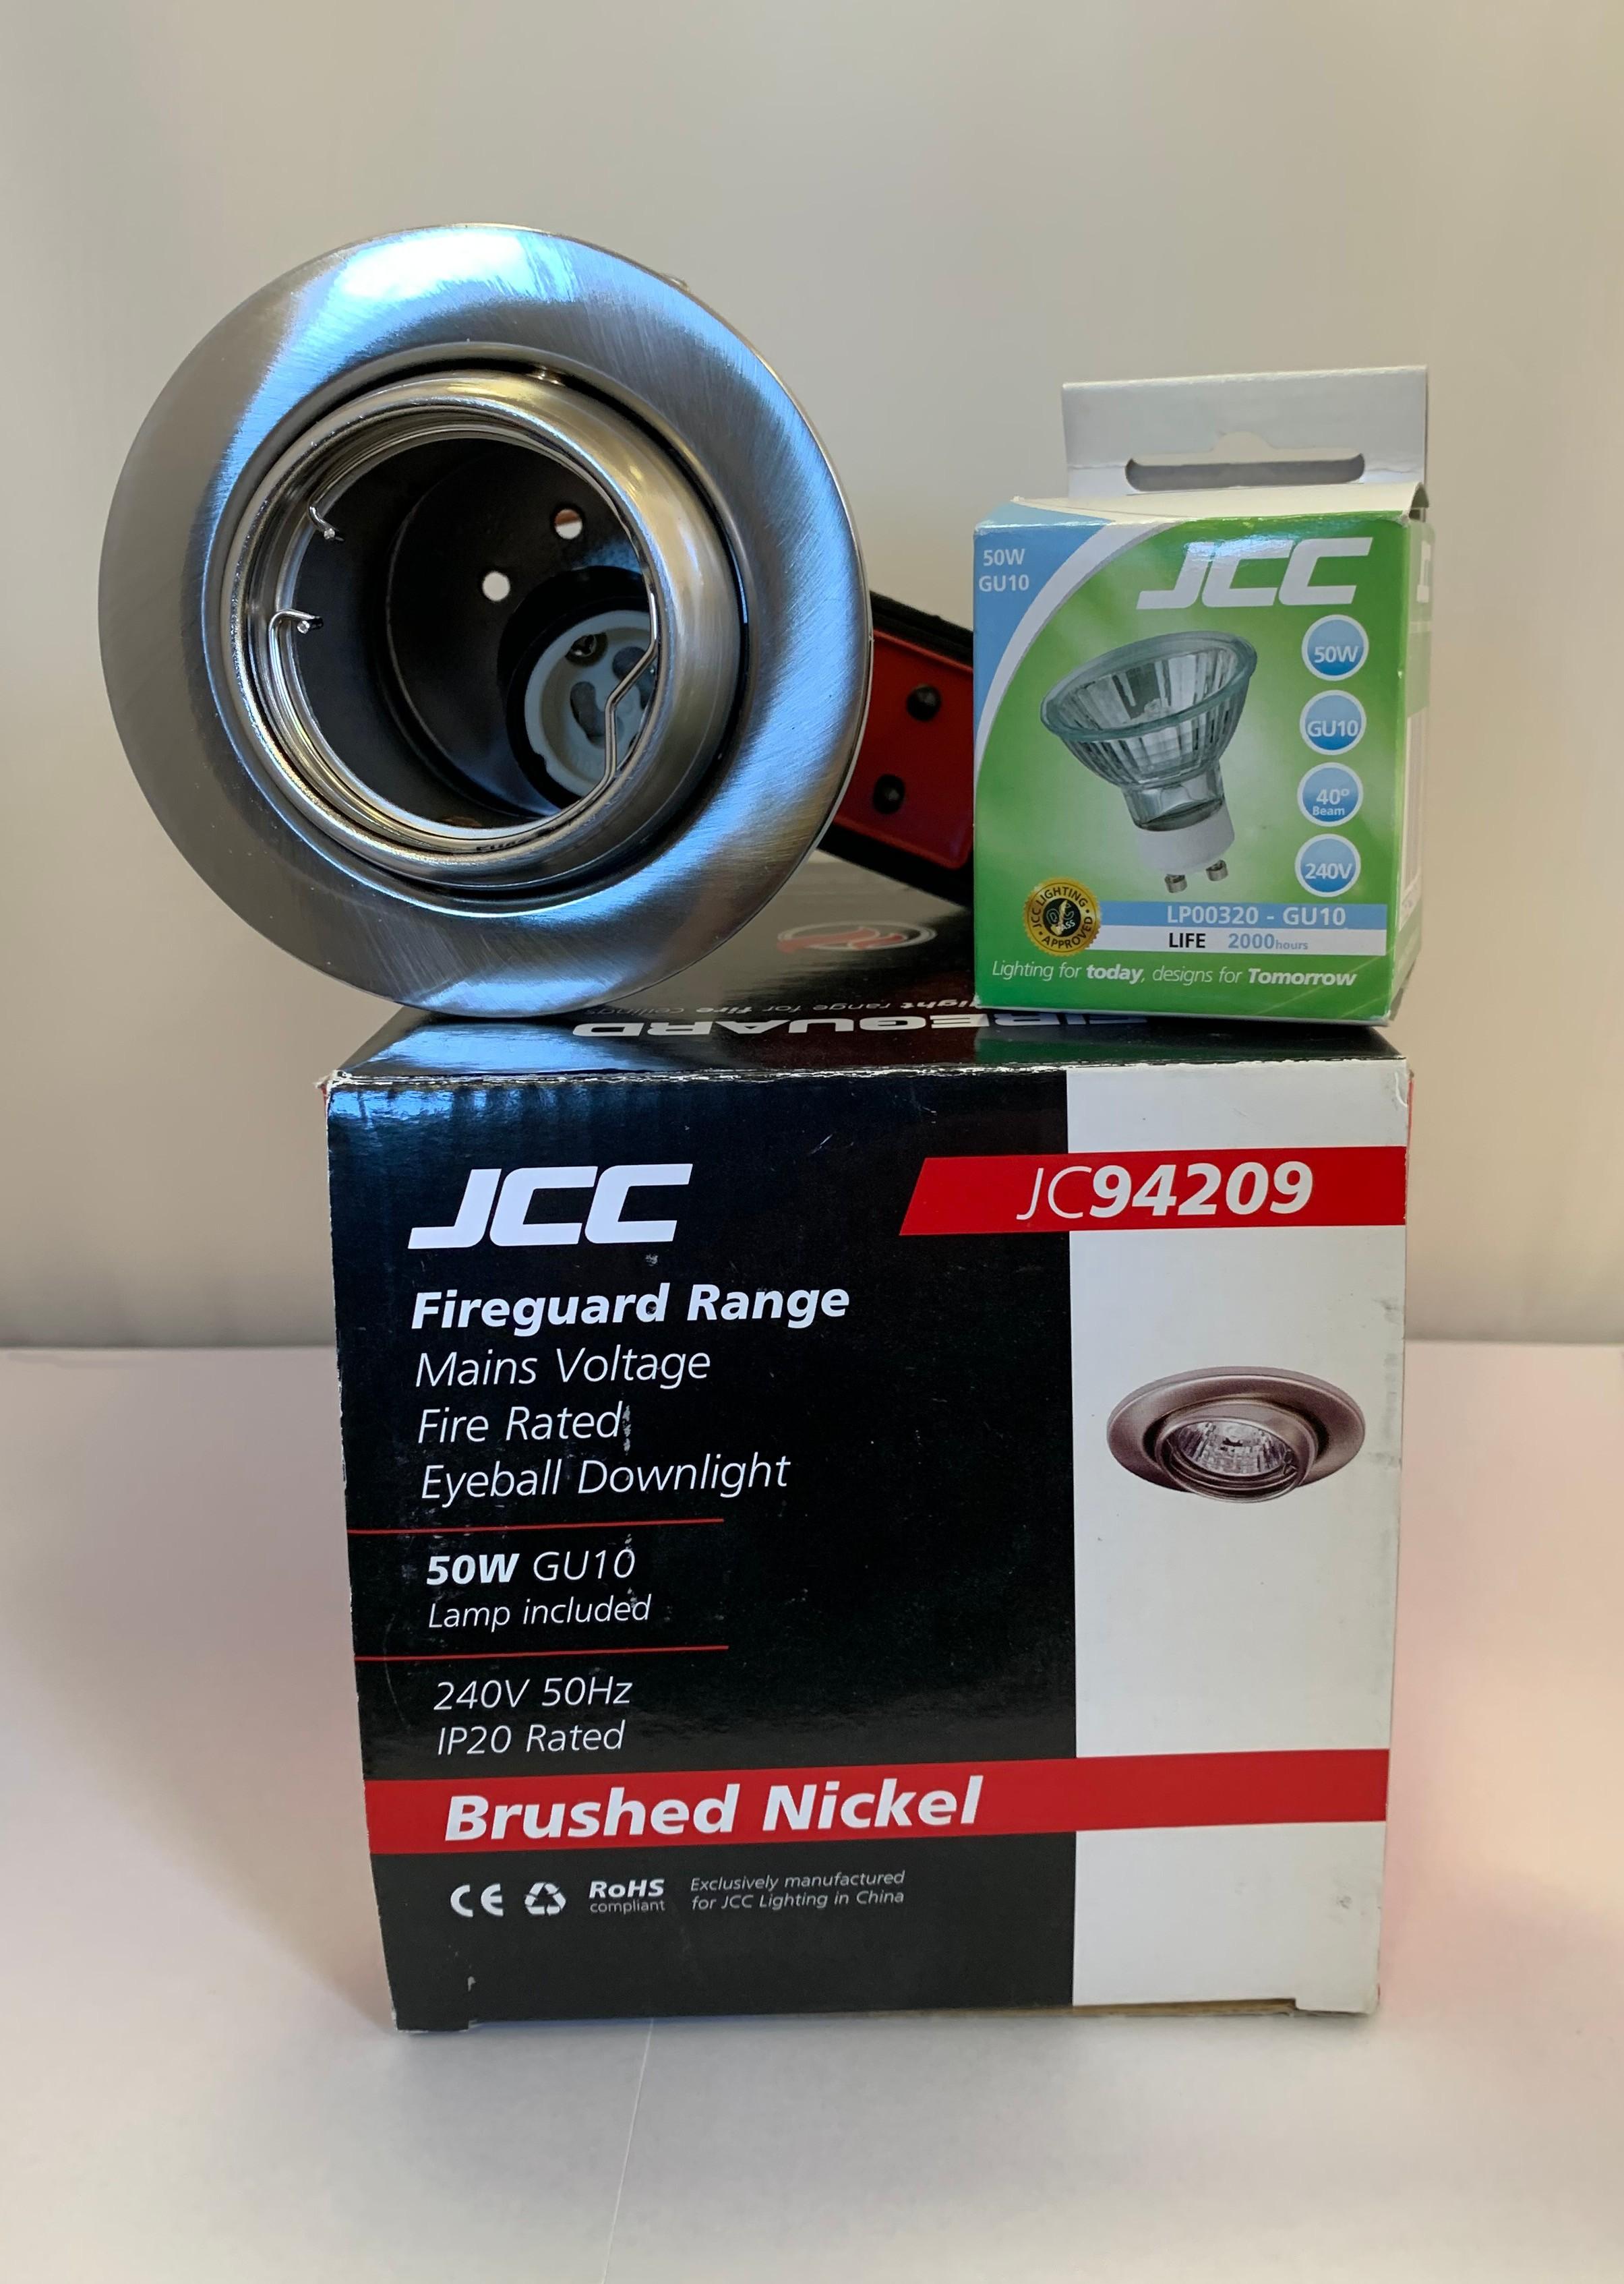 JCC JC94209BN Fireguard 240V 50Hz IP20 50W GU10 Eyeball Downlight in Brushed Nickel - Buy online or in store from John Cribb & Sons Ltd